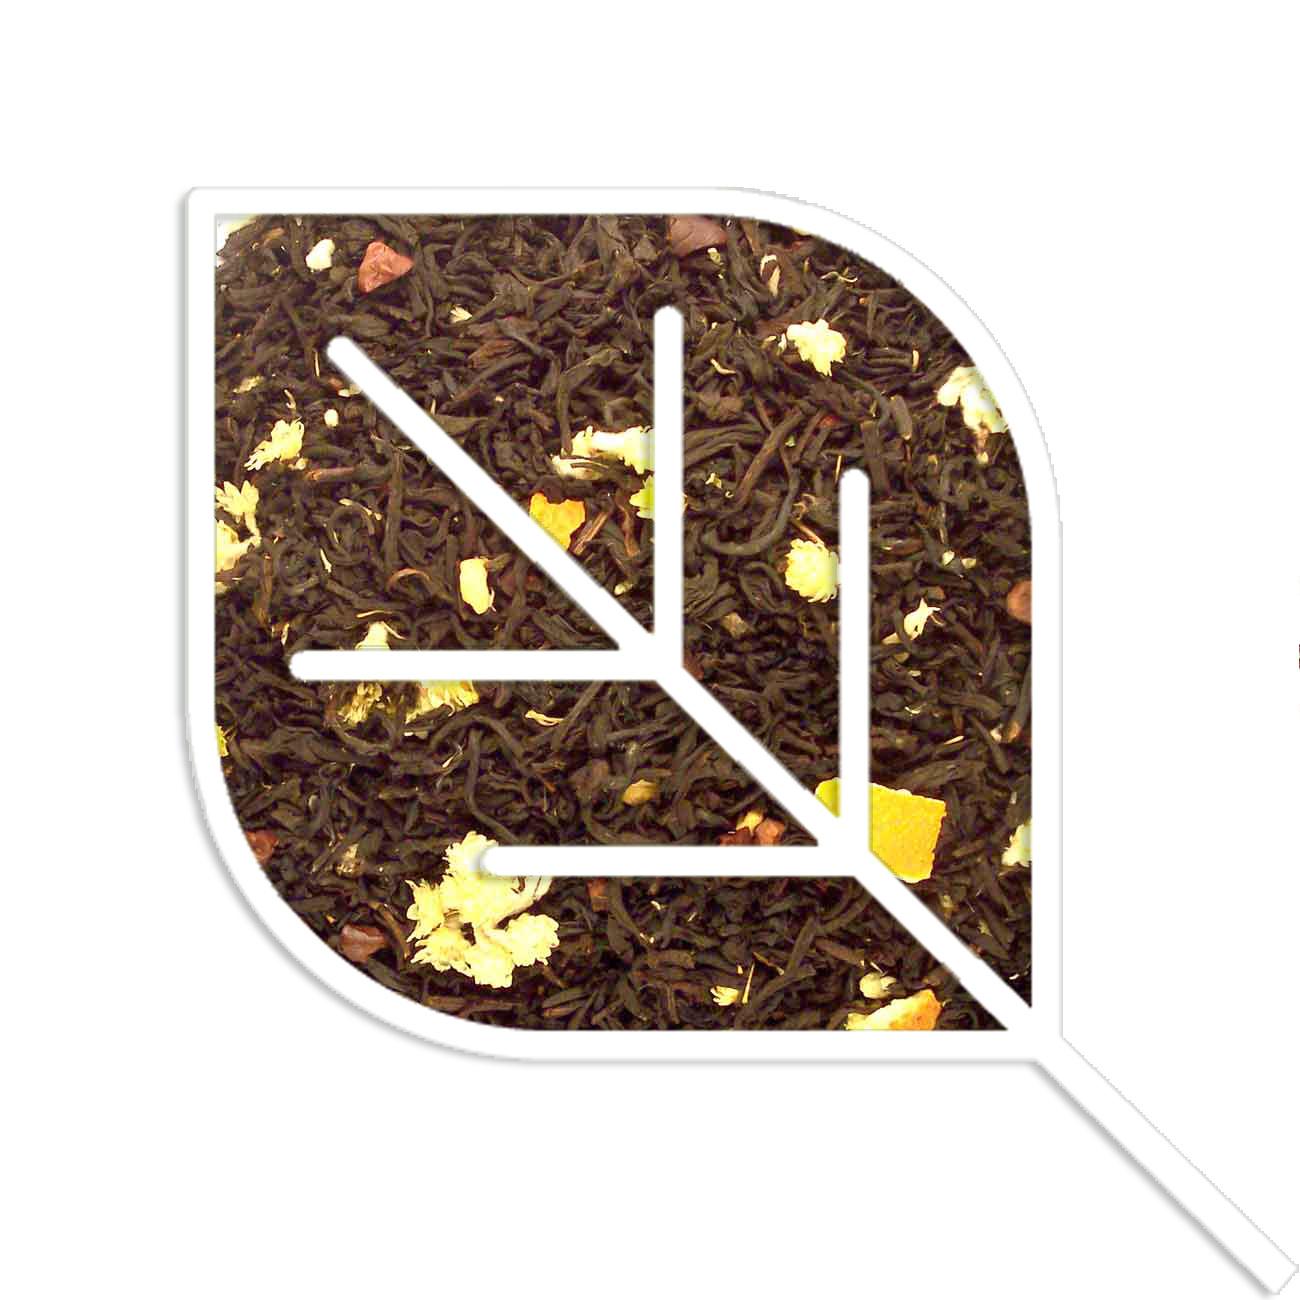 Lente thee-1